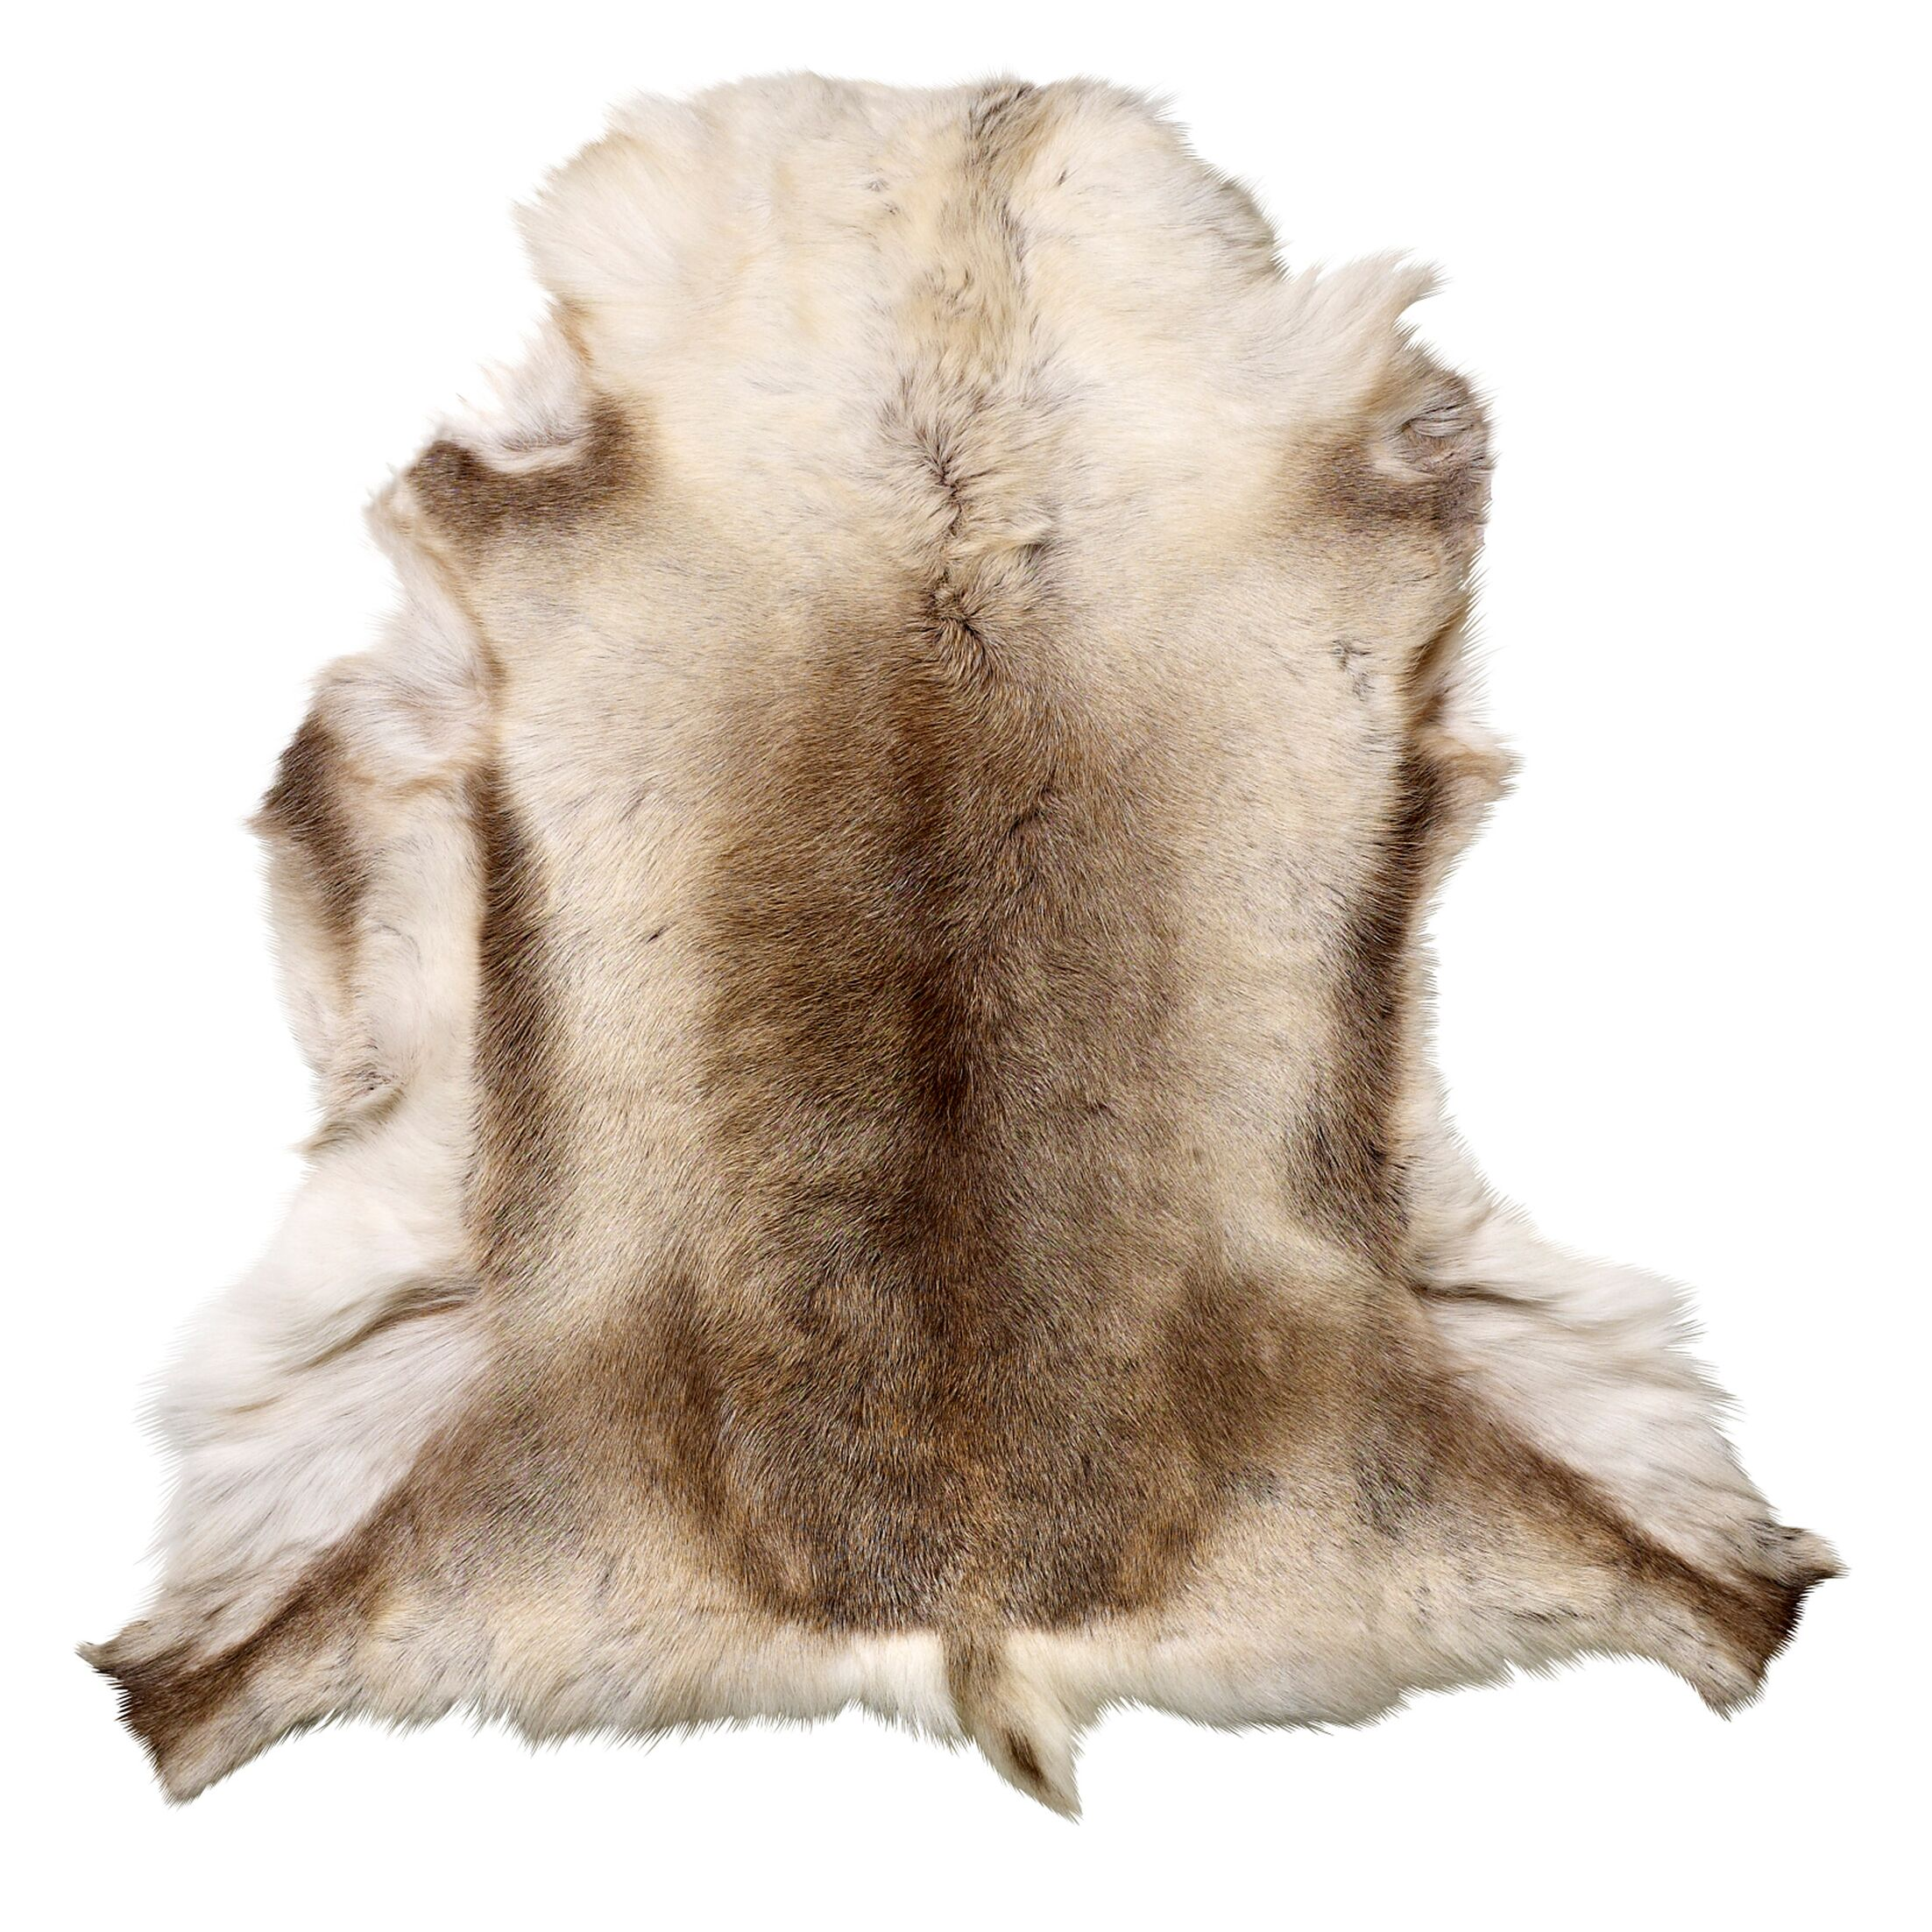 Noack Faux Sheepskin Brown/White Area Rug